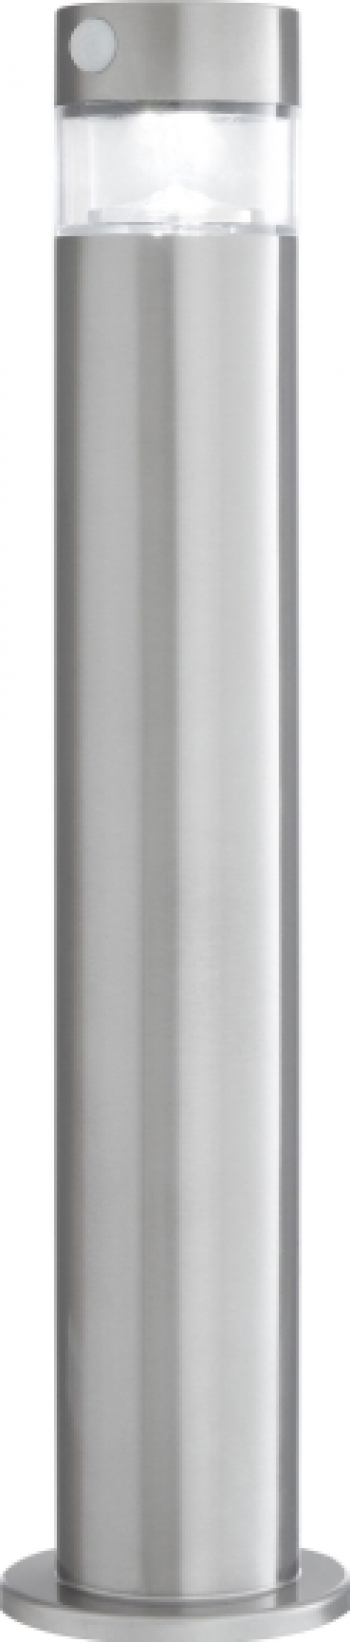 Stalp solar din inox cu senzor de miscare si timmer 49cm LED 2W Karina